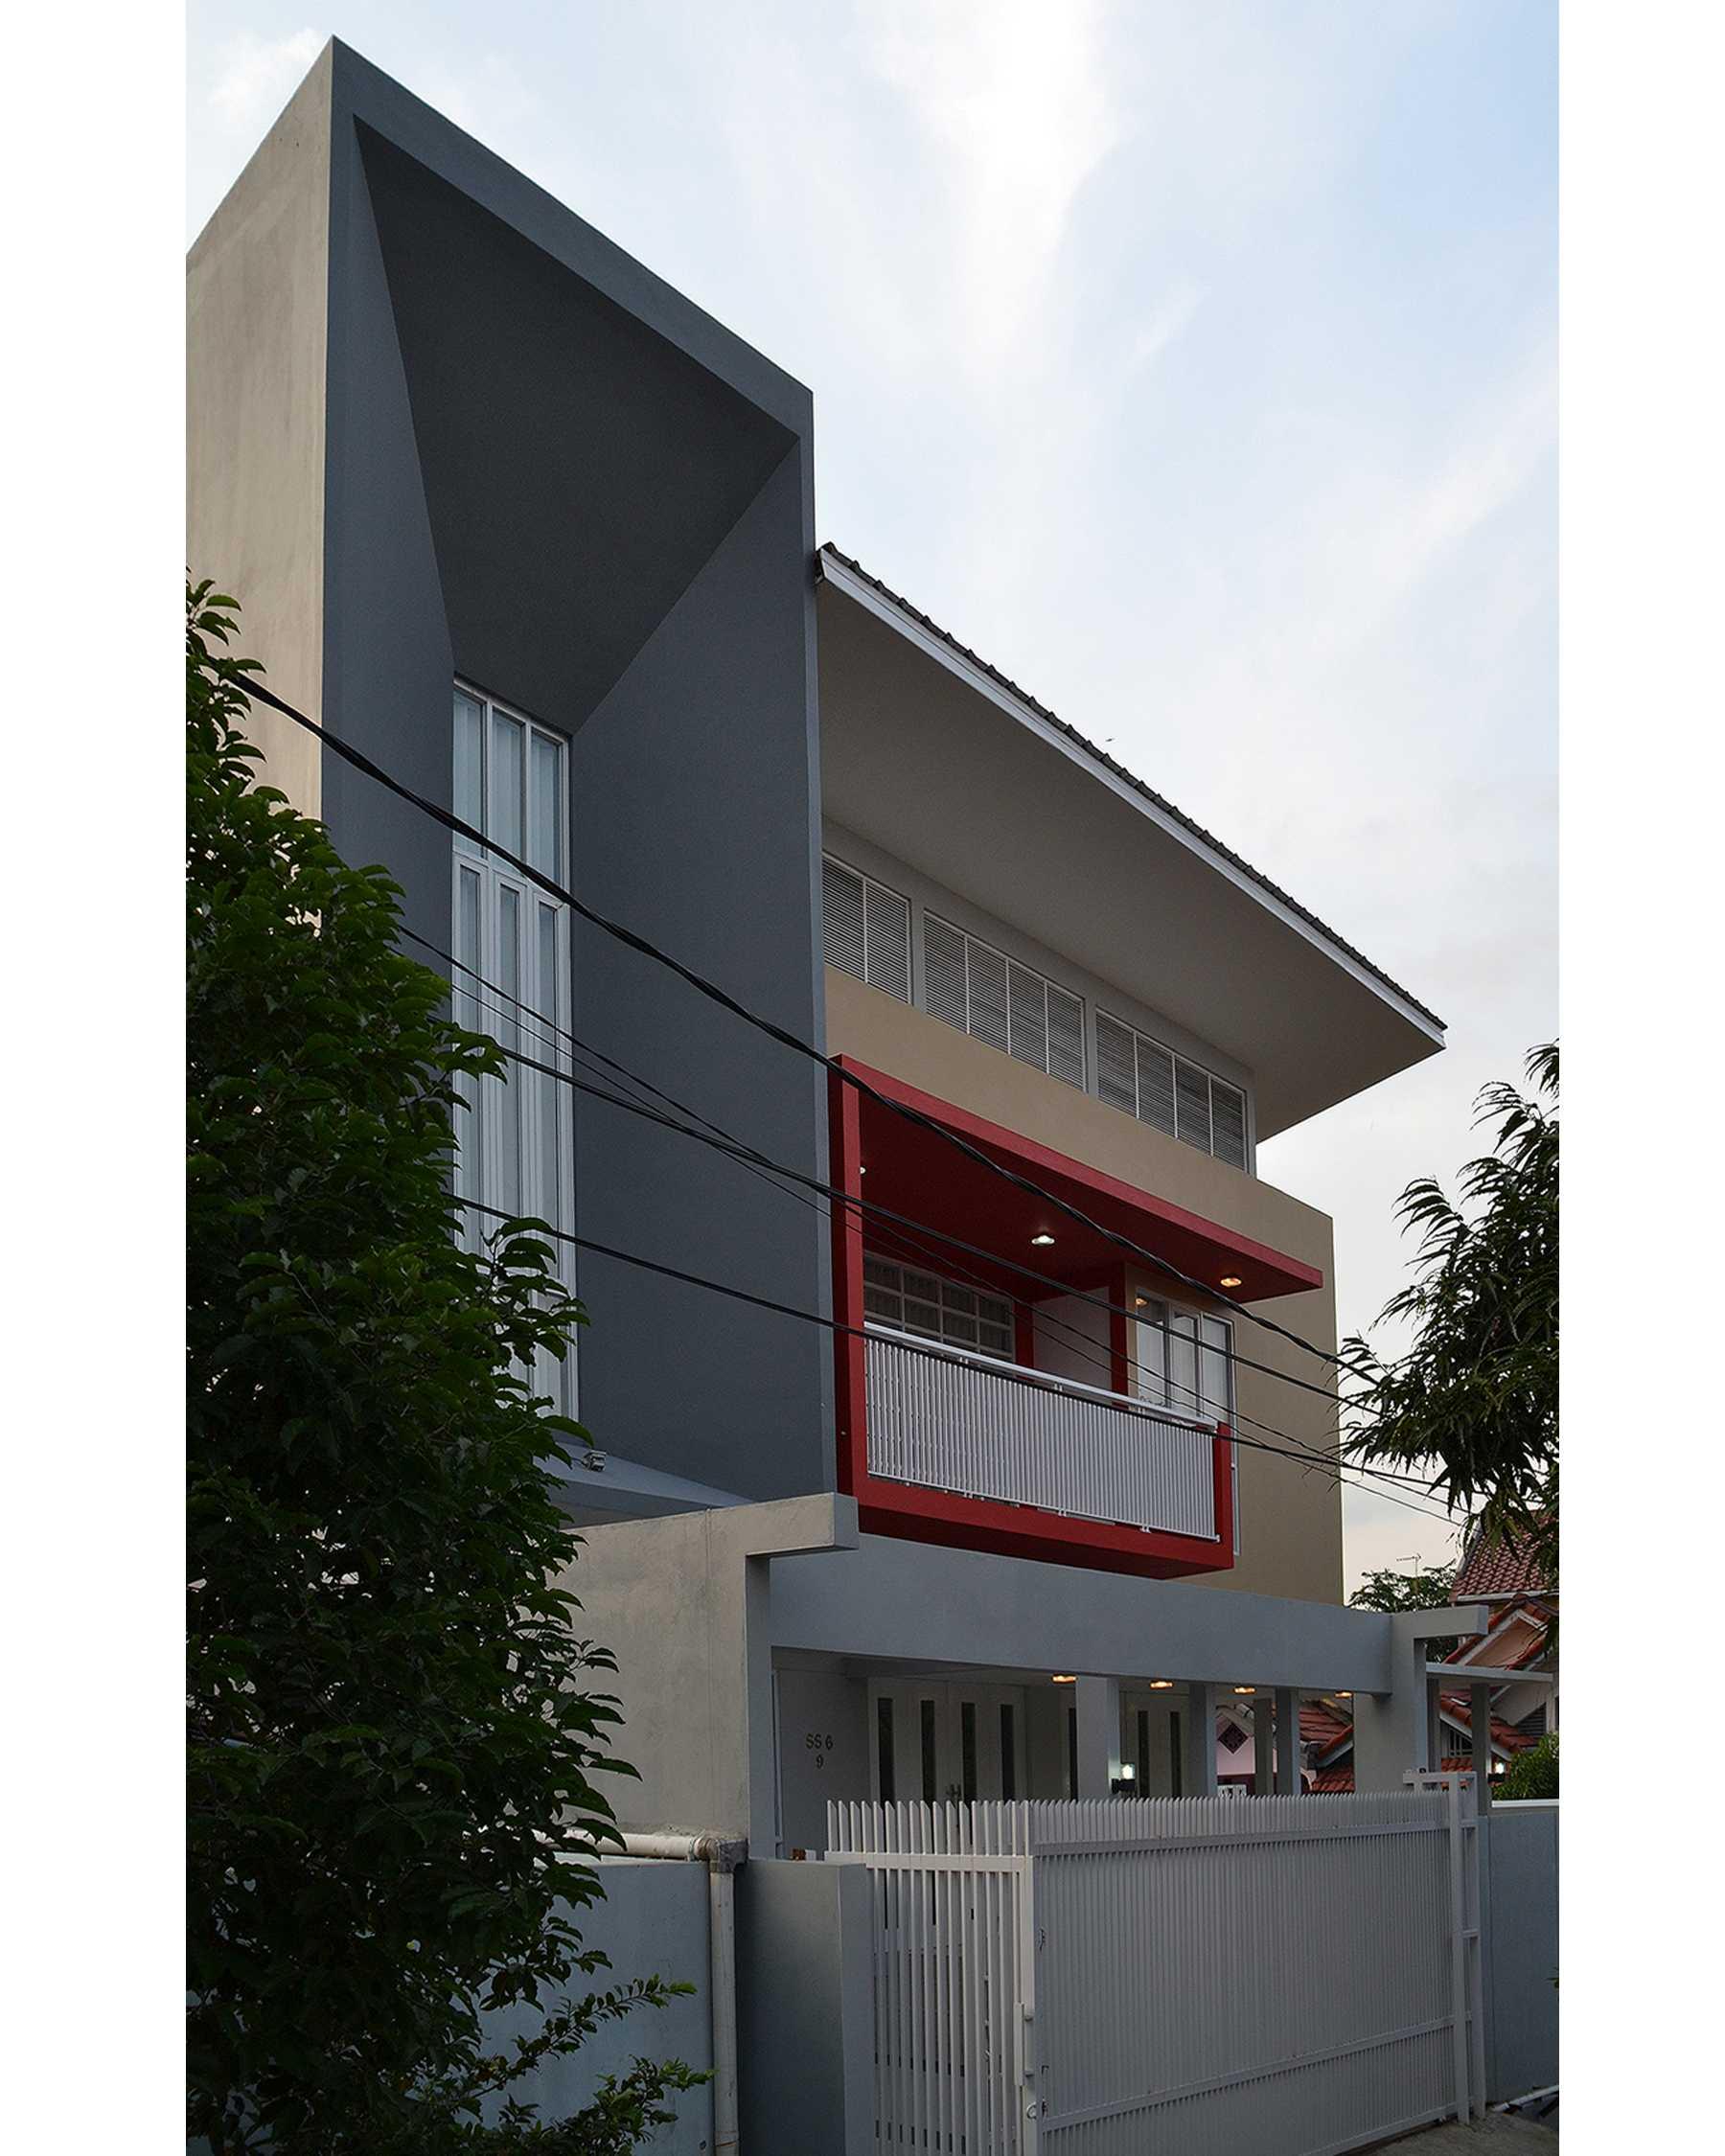 Arsitek Pramudya Rumah Bintara Bintara, Kec. Bekasi Bar., Kota Bks, Jawa Barat, Indonesia Bintara, Kec. Bekasi Bar., Kota Bks, Jawa Barat, Indonesia Arsitek-Pramudya-Rumah-Bintara   96767